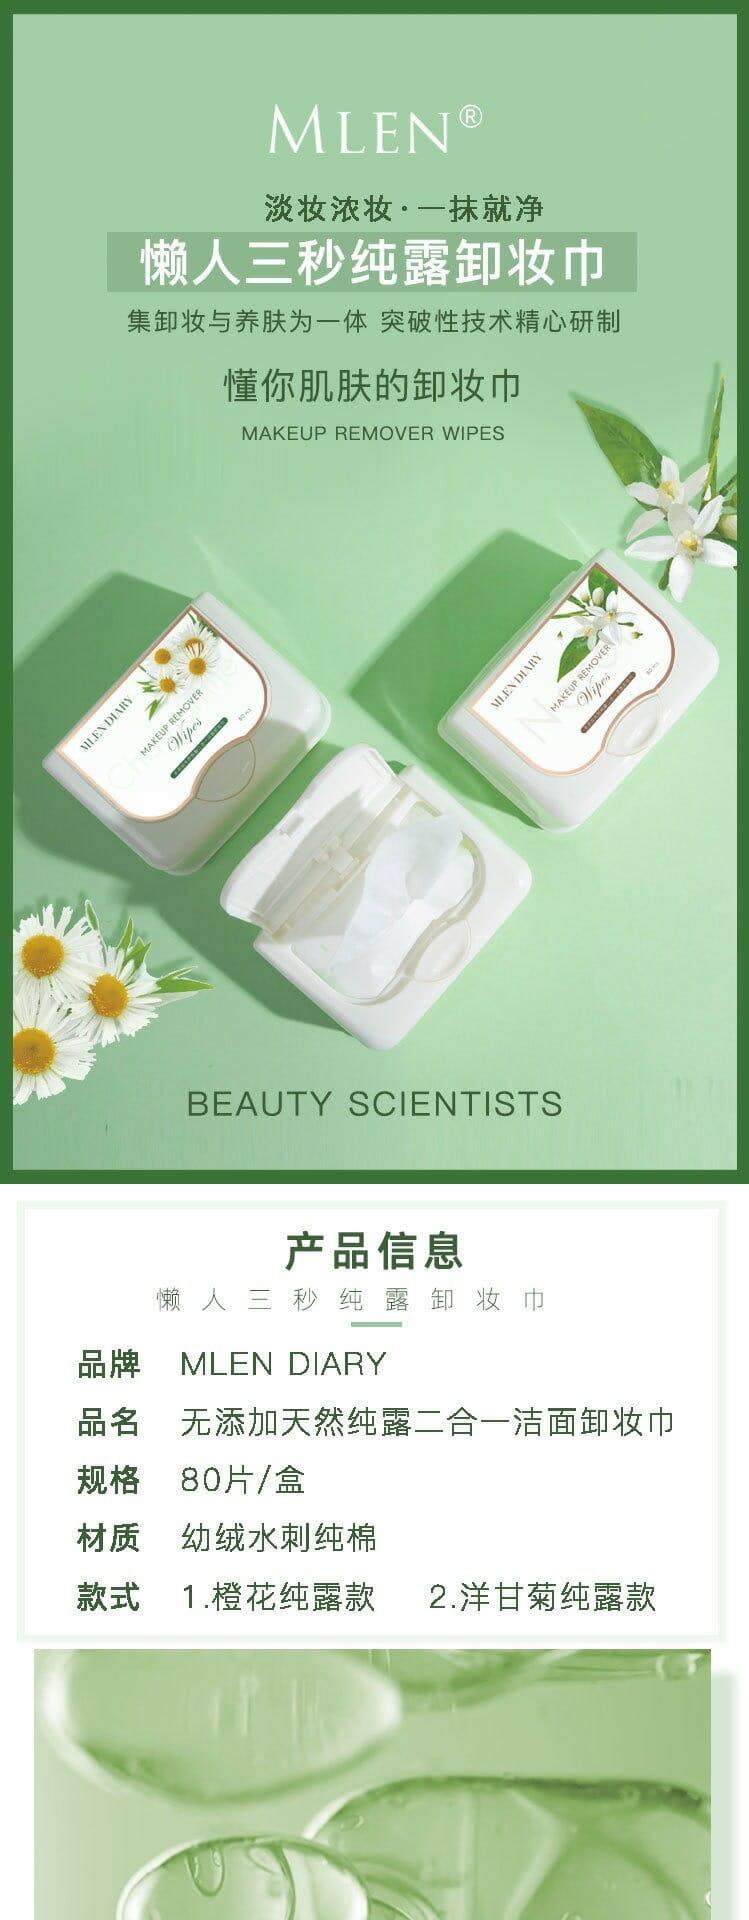 mlen group mlen makeup remover wipes 4